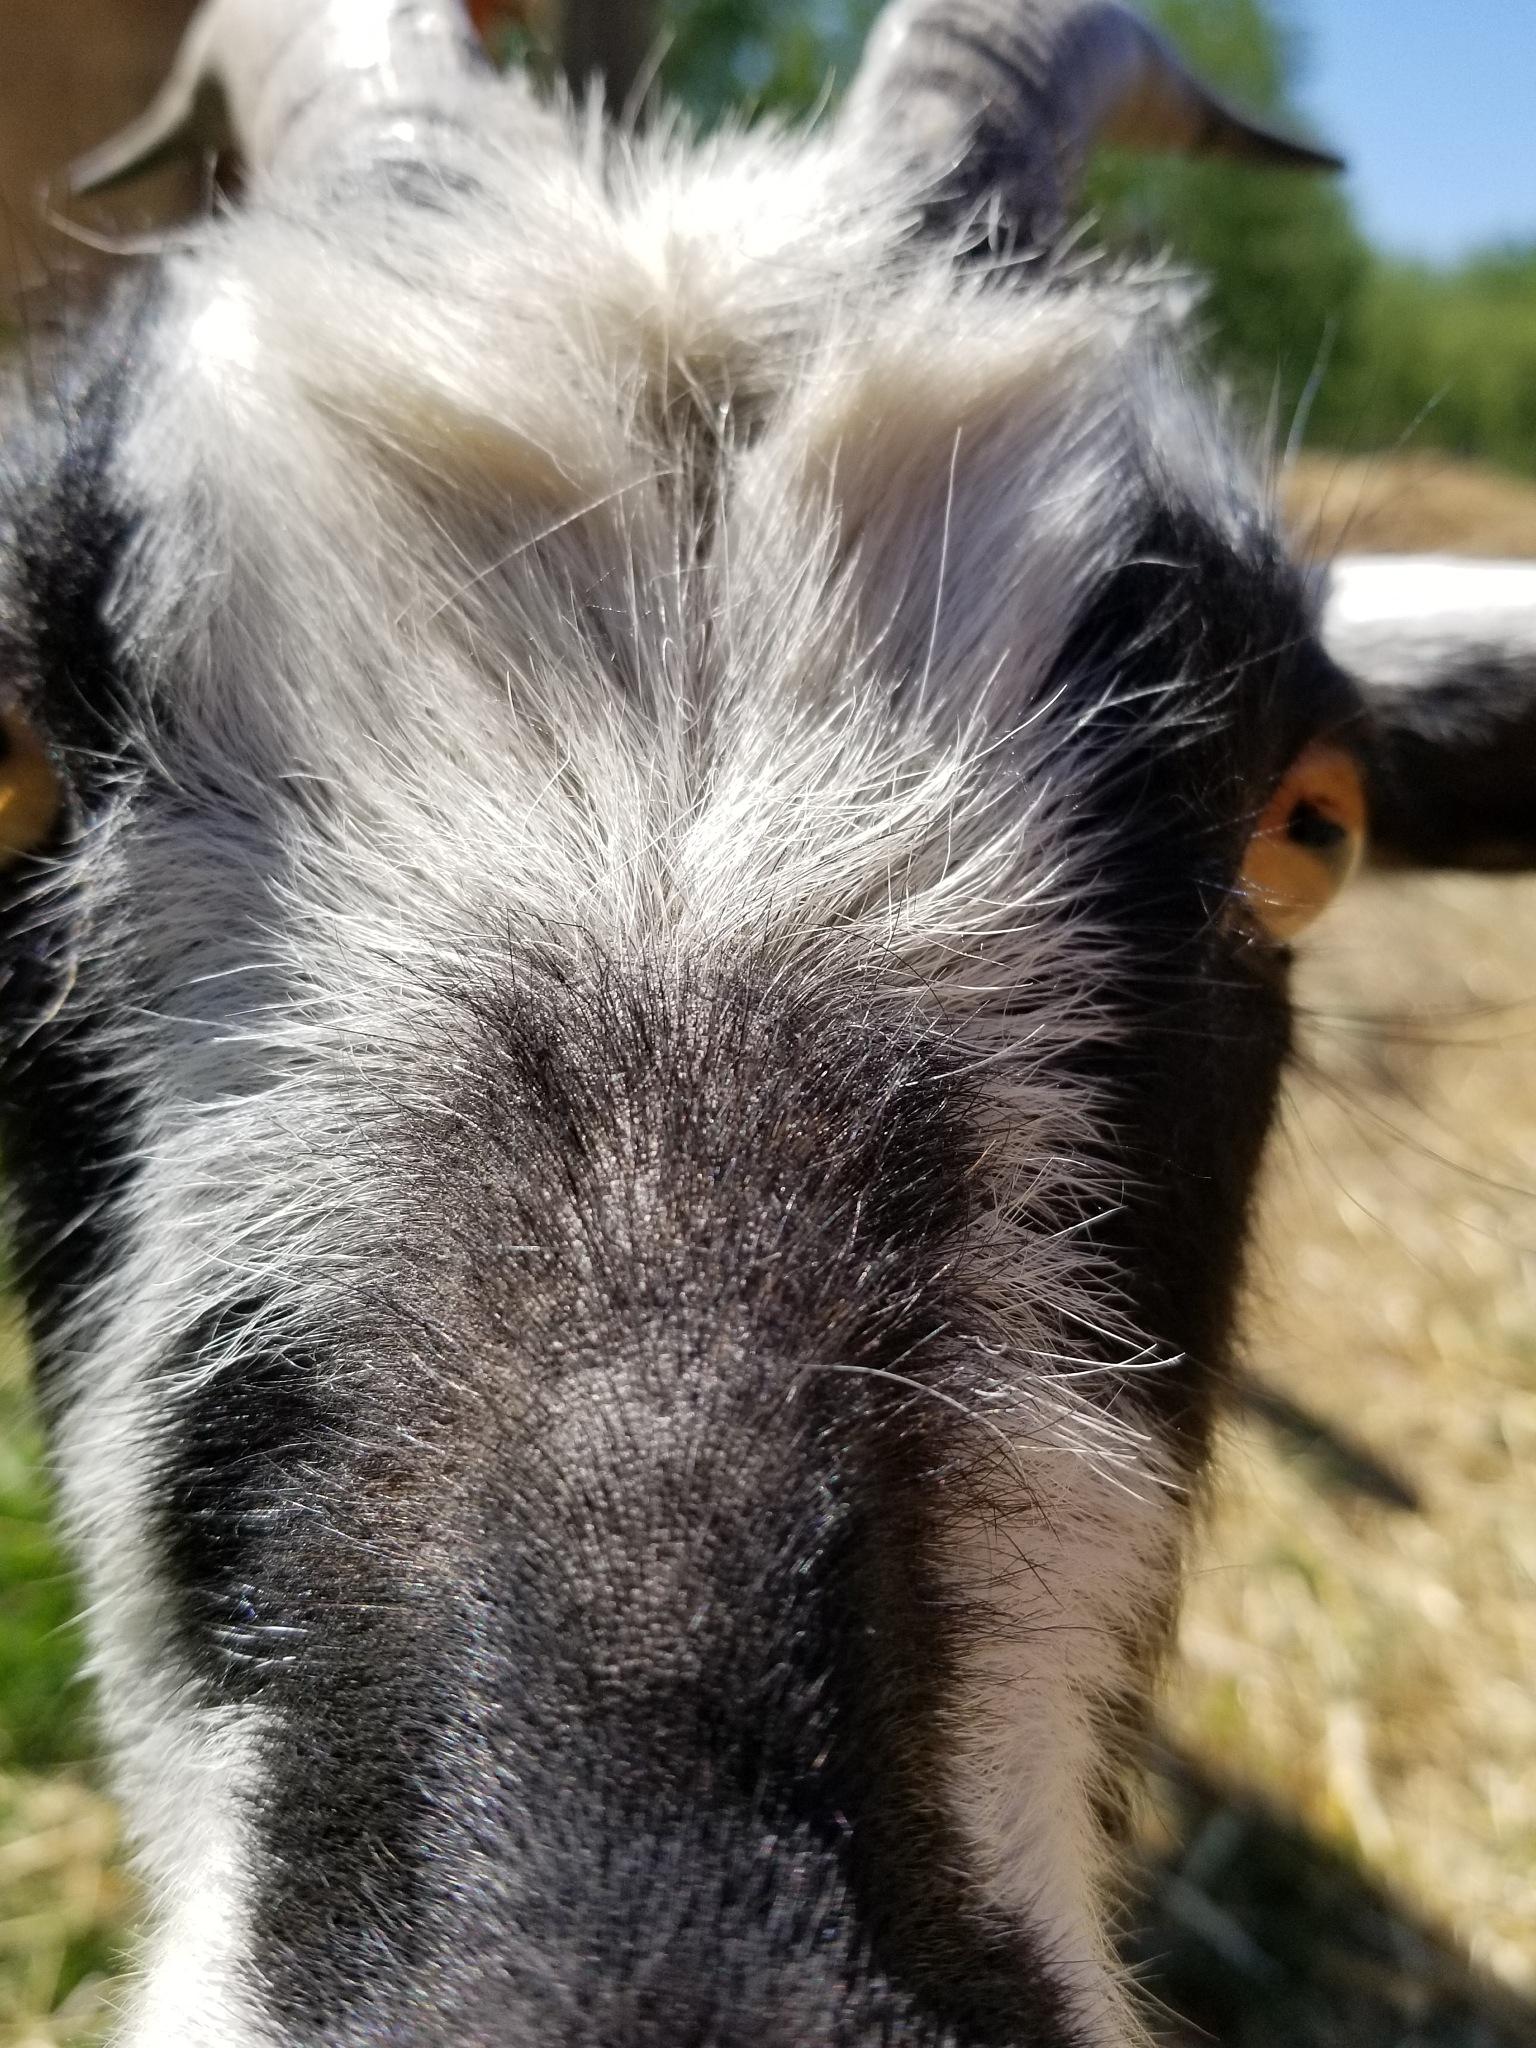 Curious goat. by Amanda Kohlman